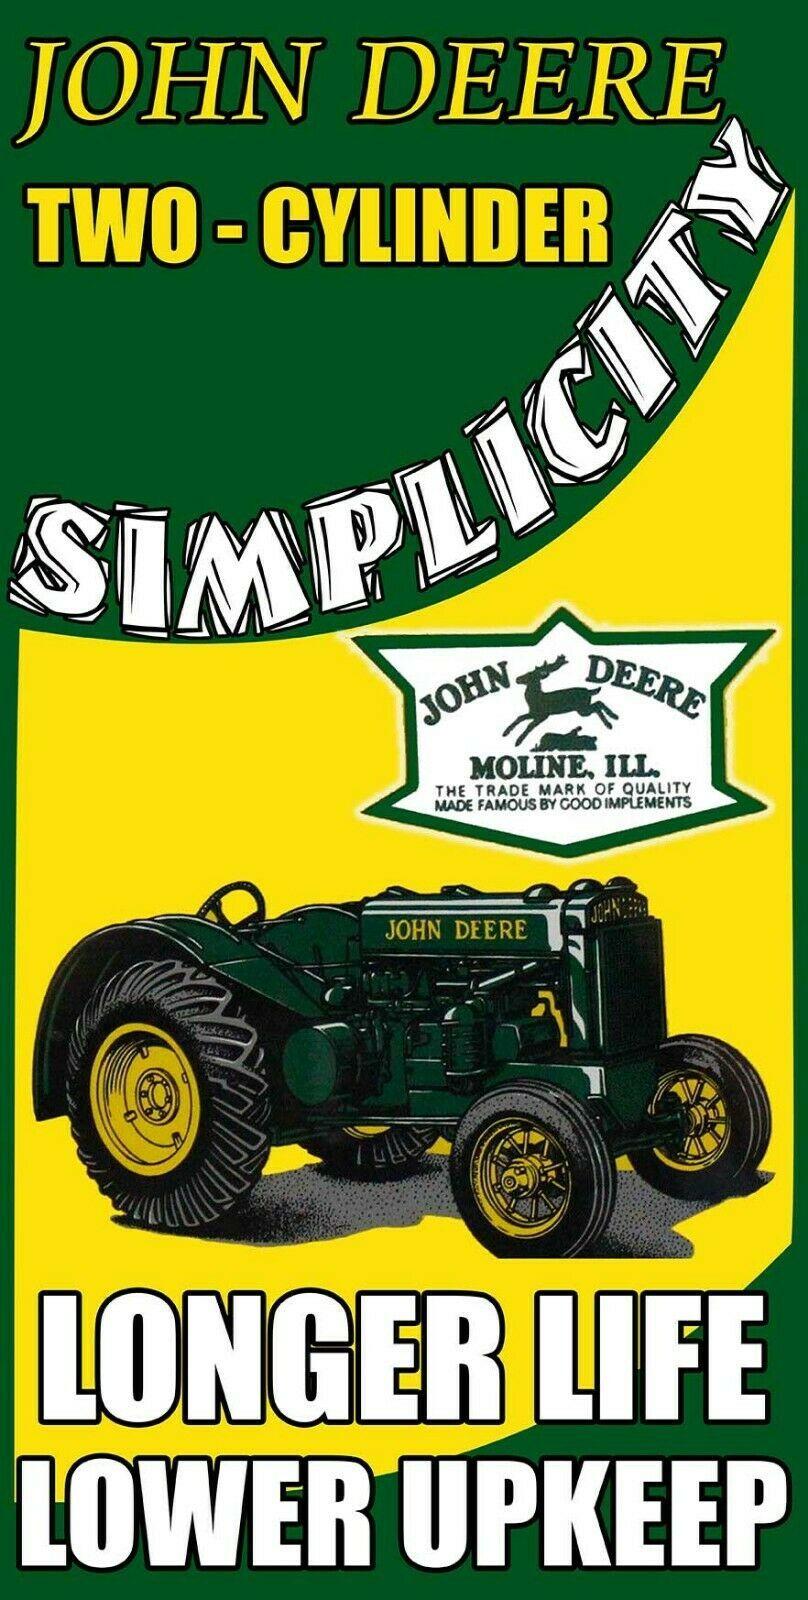 John Deere Simplicity Longer Life Tractor for Farming Metal Sign